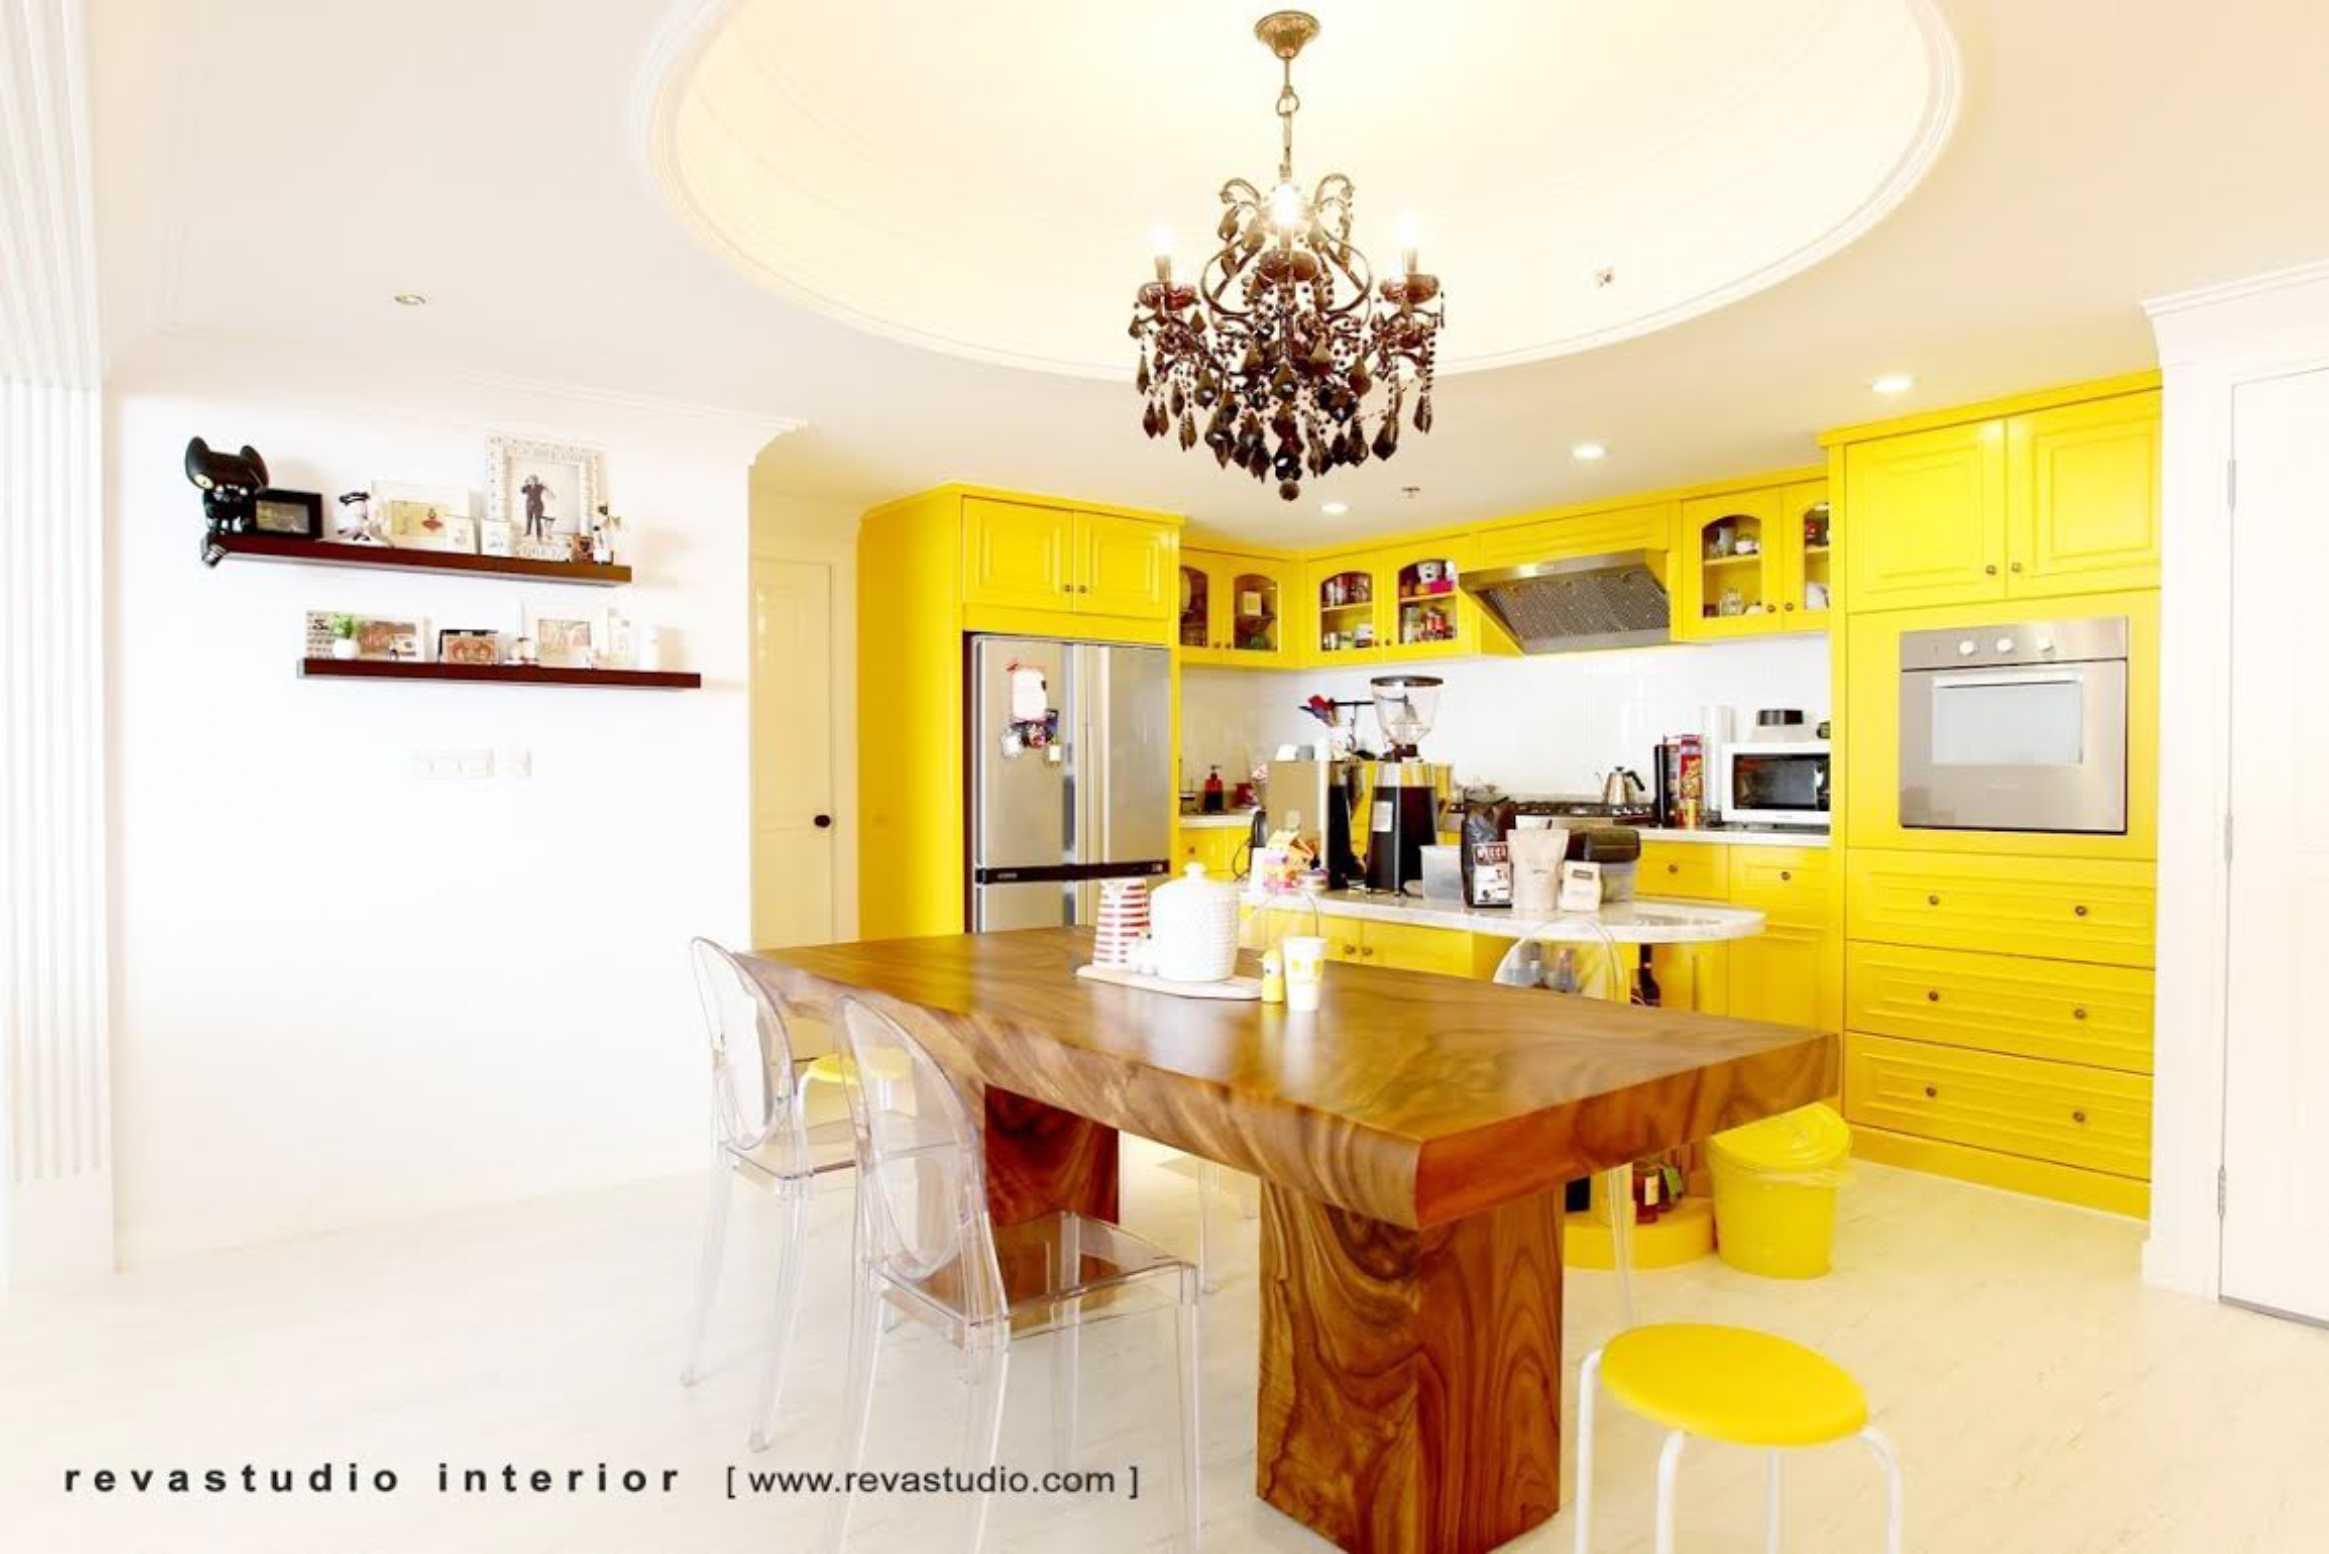 Revano Satria The Lego Apartment Jakarta, Indonesia Jakarta, Indonesia Kitchen & Dining Room   15530